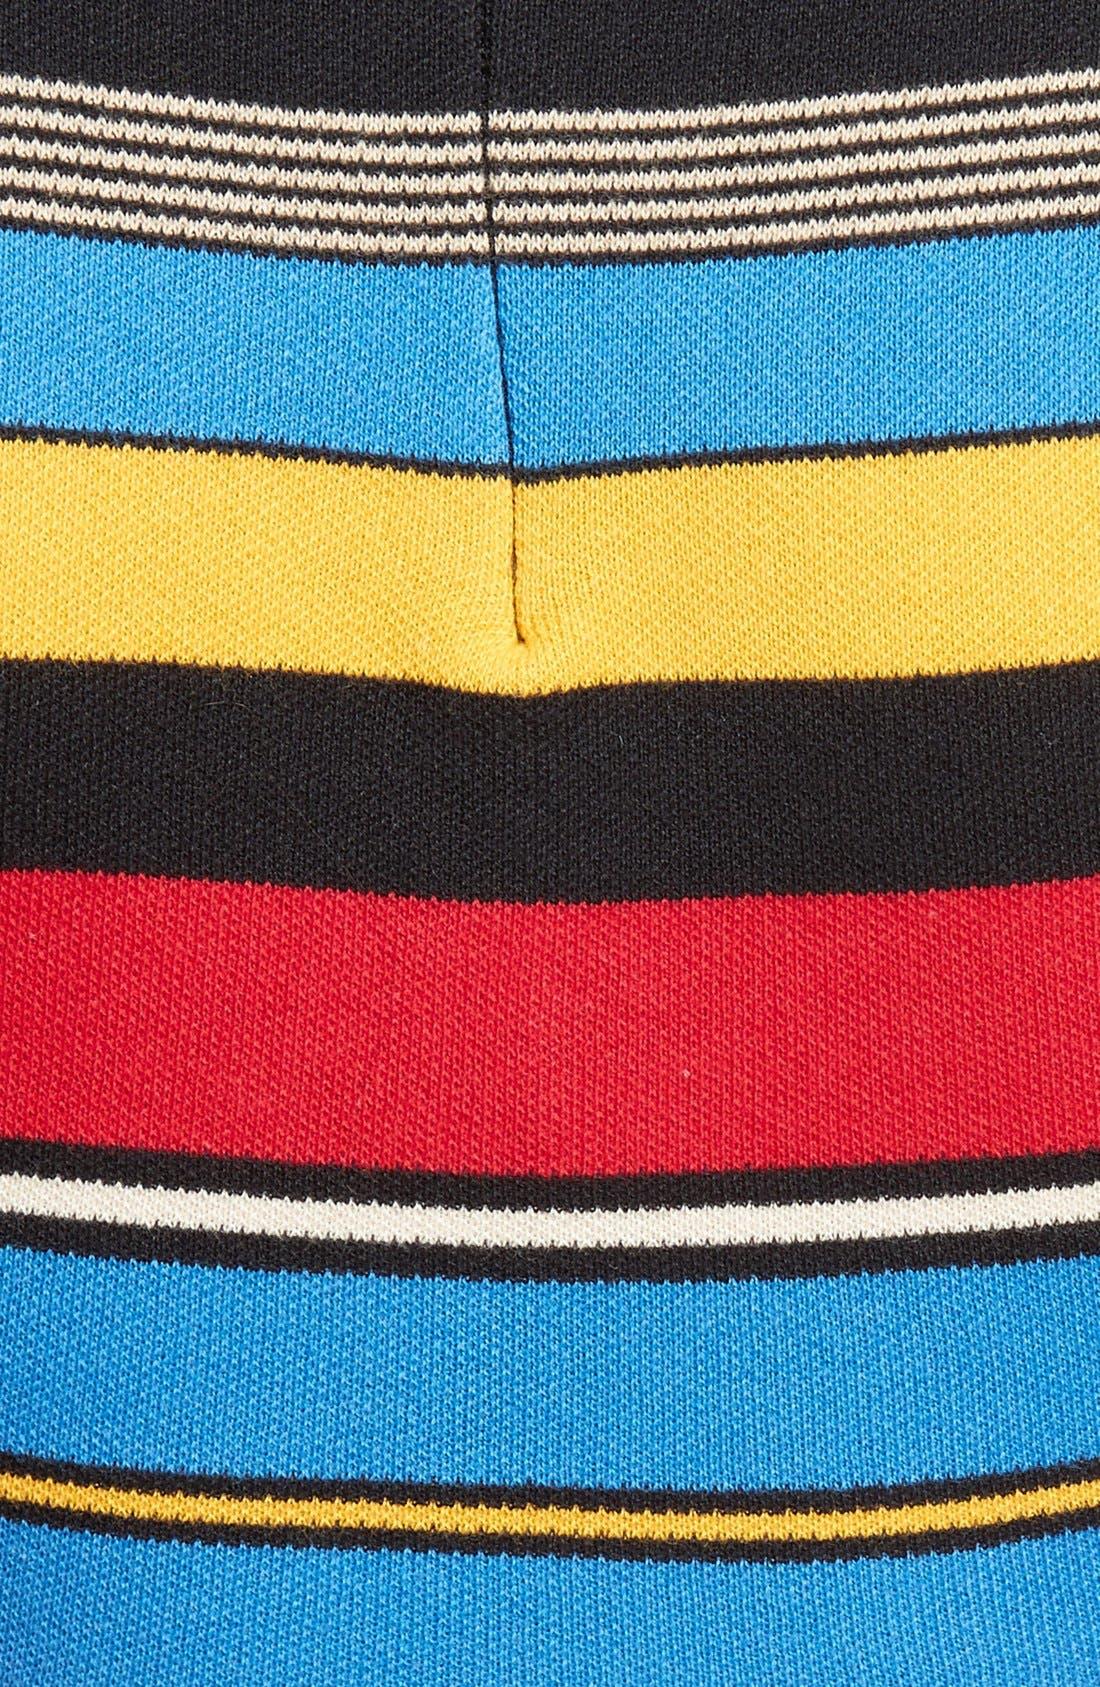 Stripe Crop Top,                             Alternate thumbnail 6, color,                             Multi